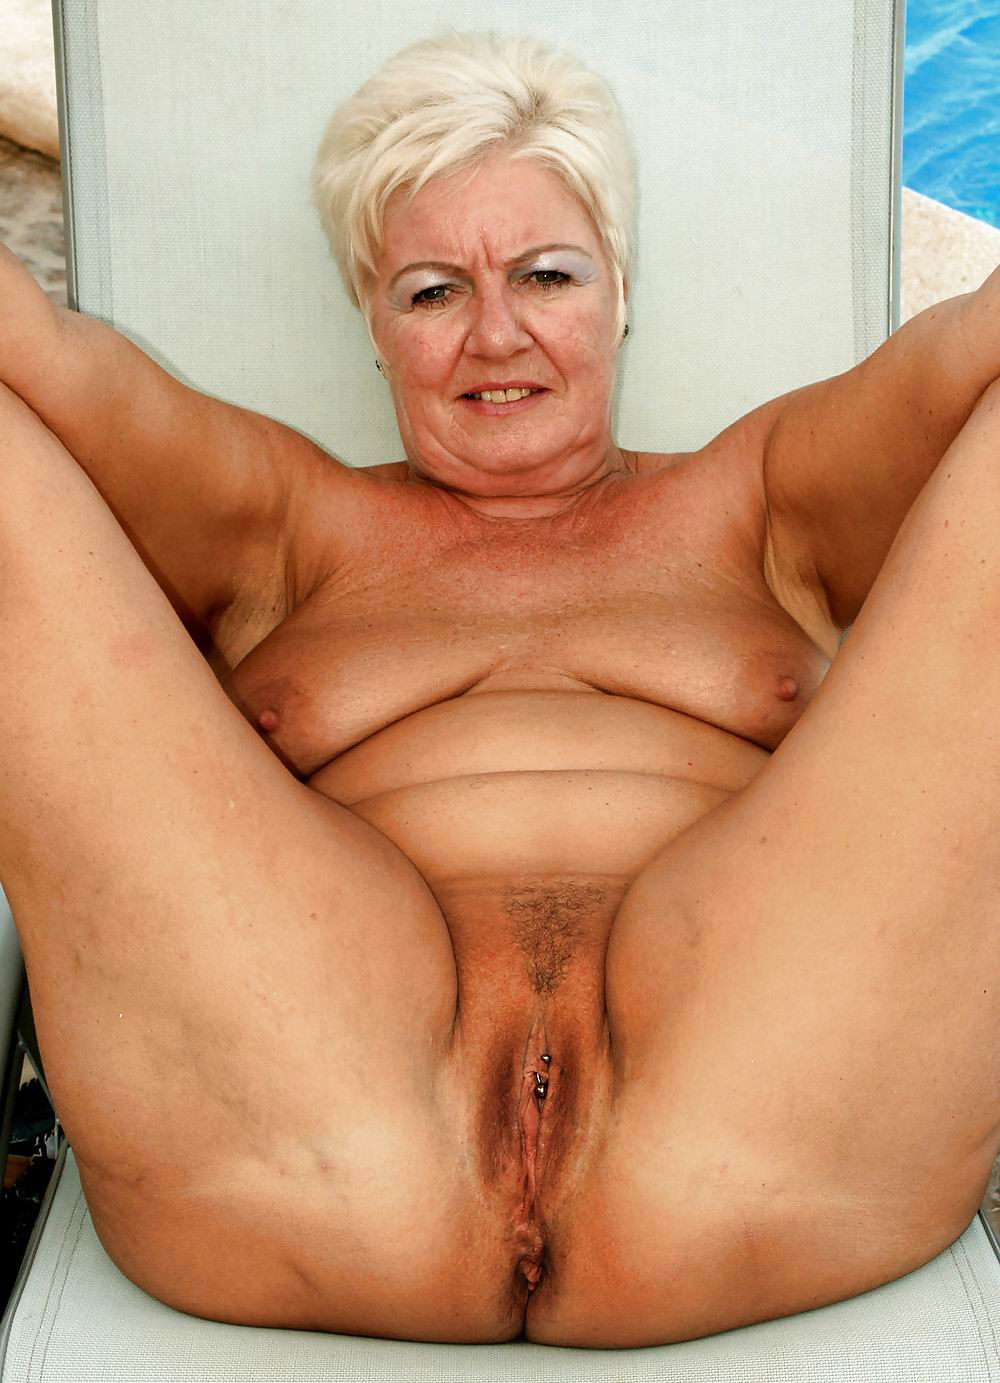 Pic porn centauren naked download